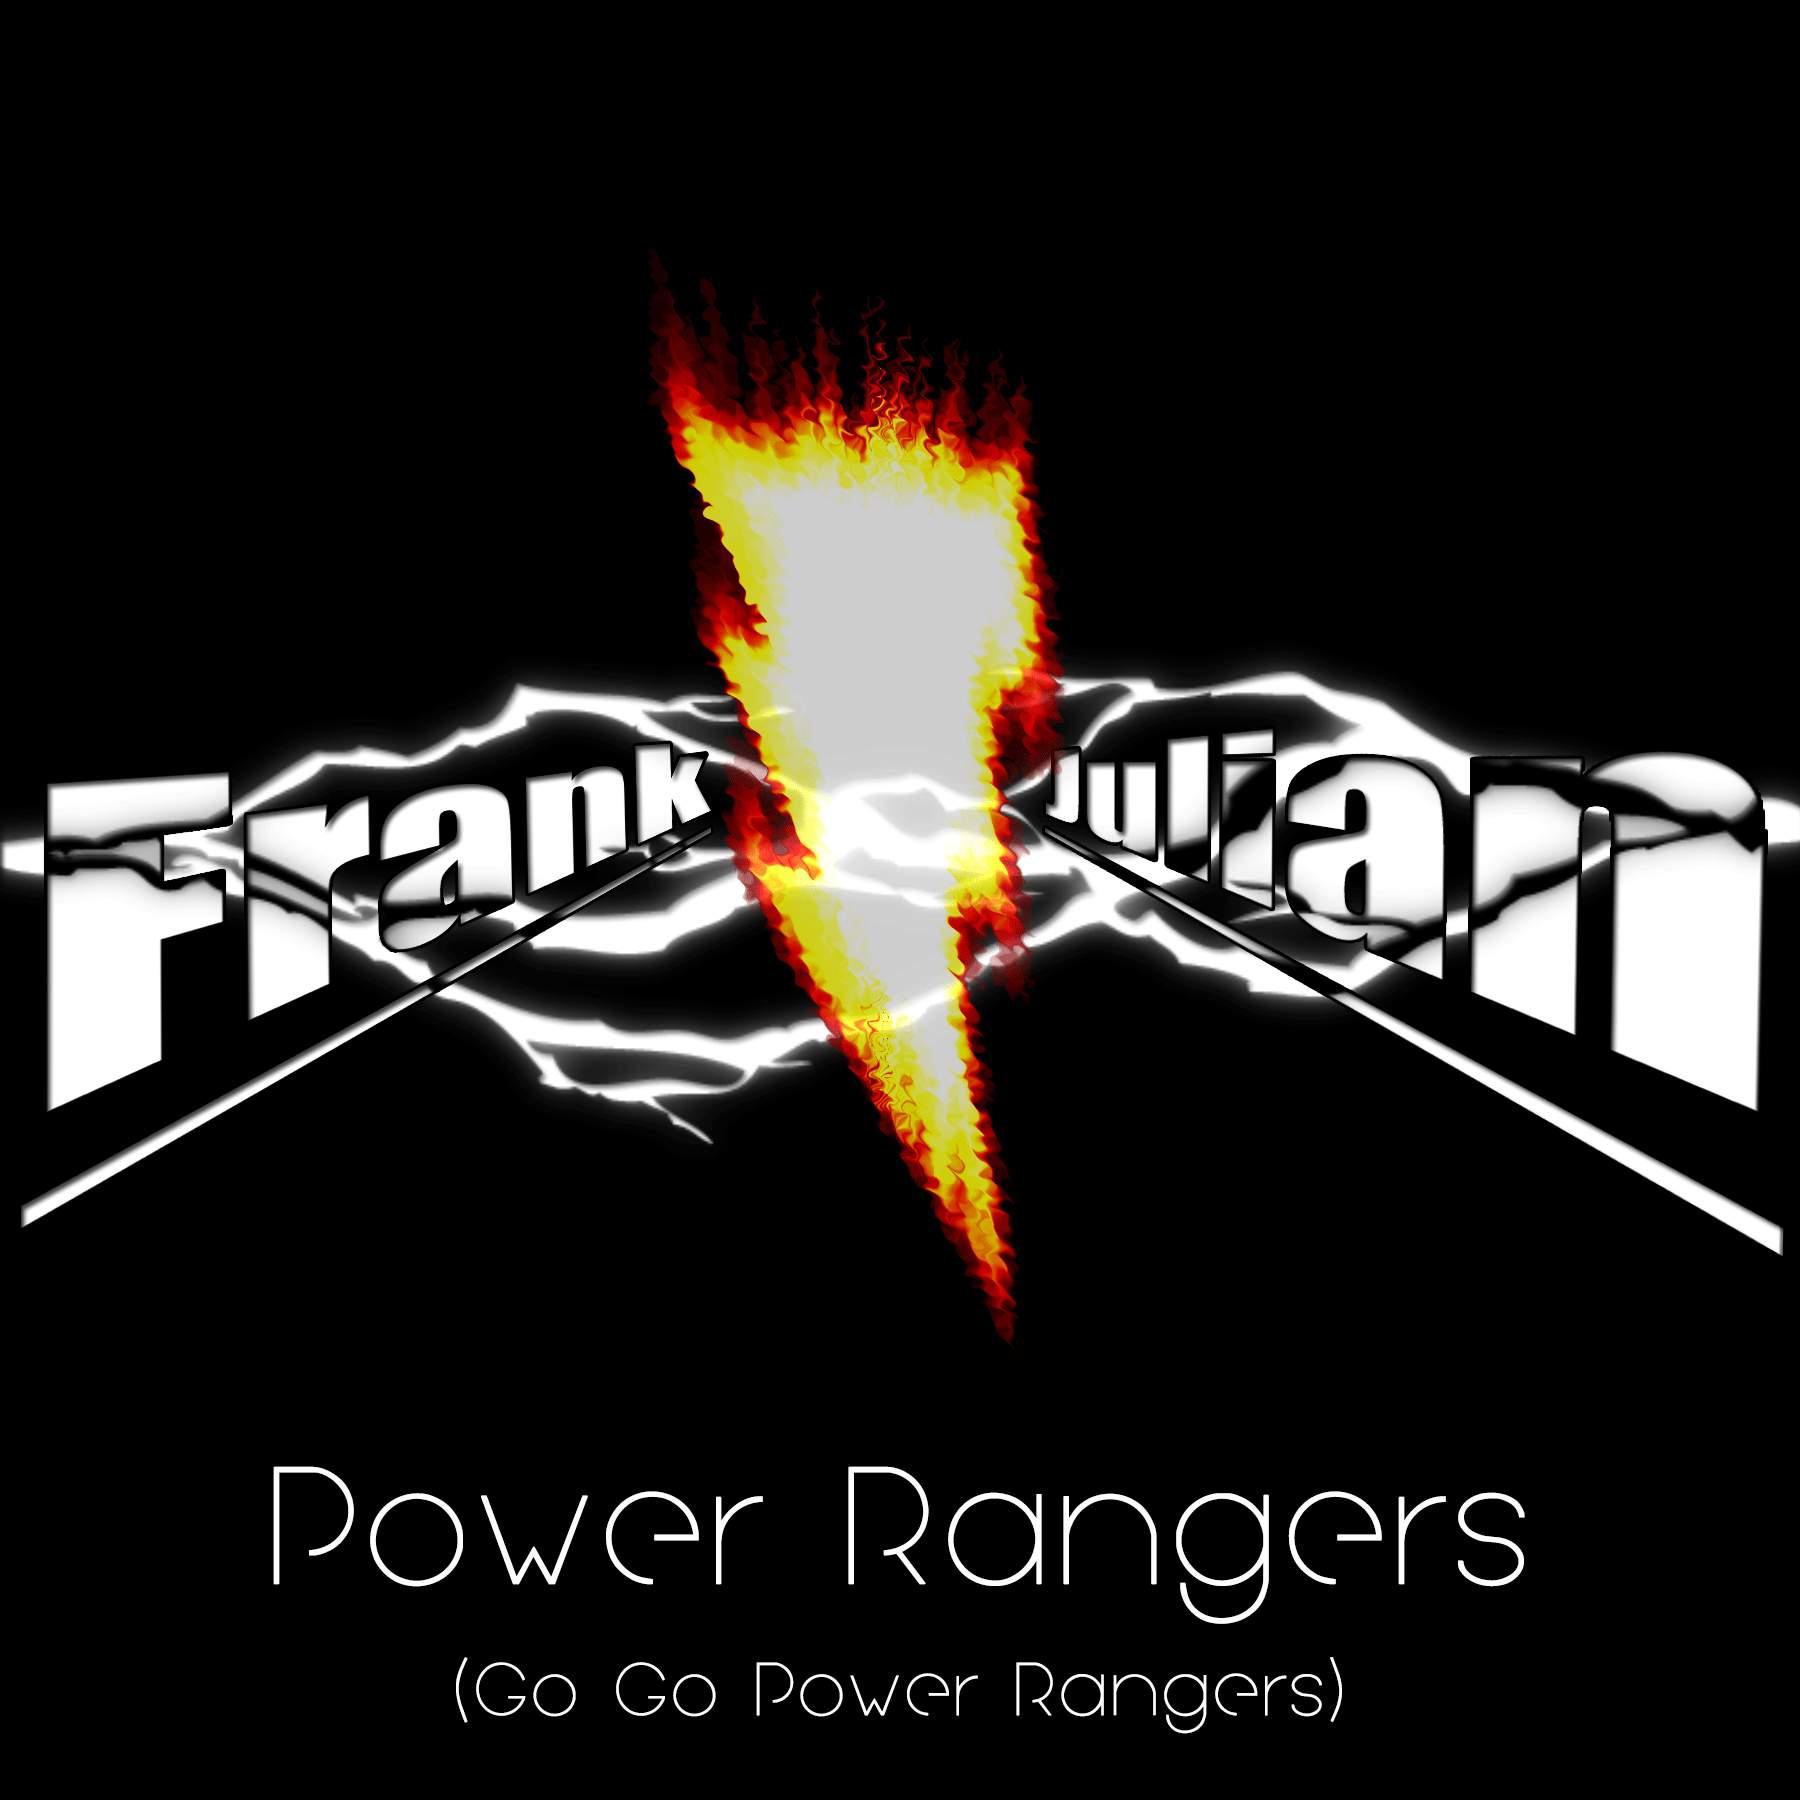 Julian, Frank: Frank Julian meets Power Rangers: Go Go Power Rangers (SNES Main Theme Metal Cover)